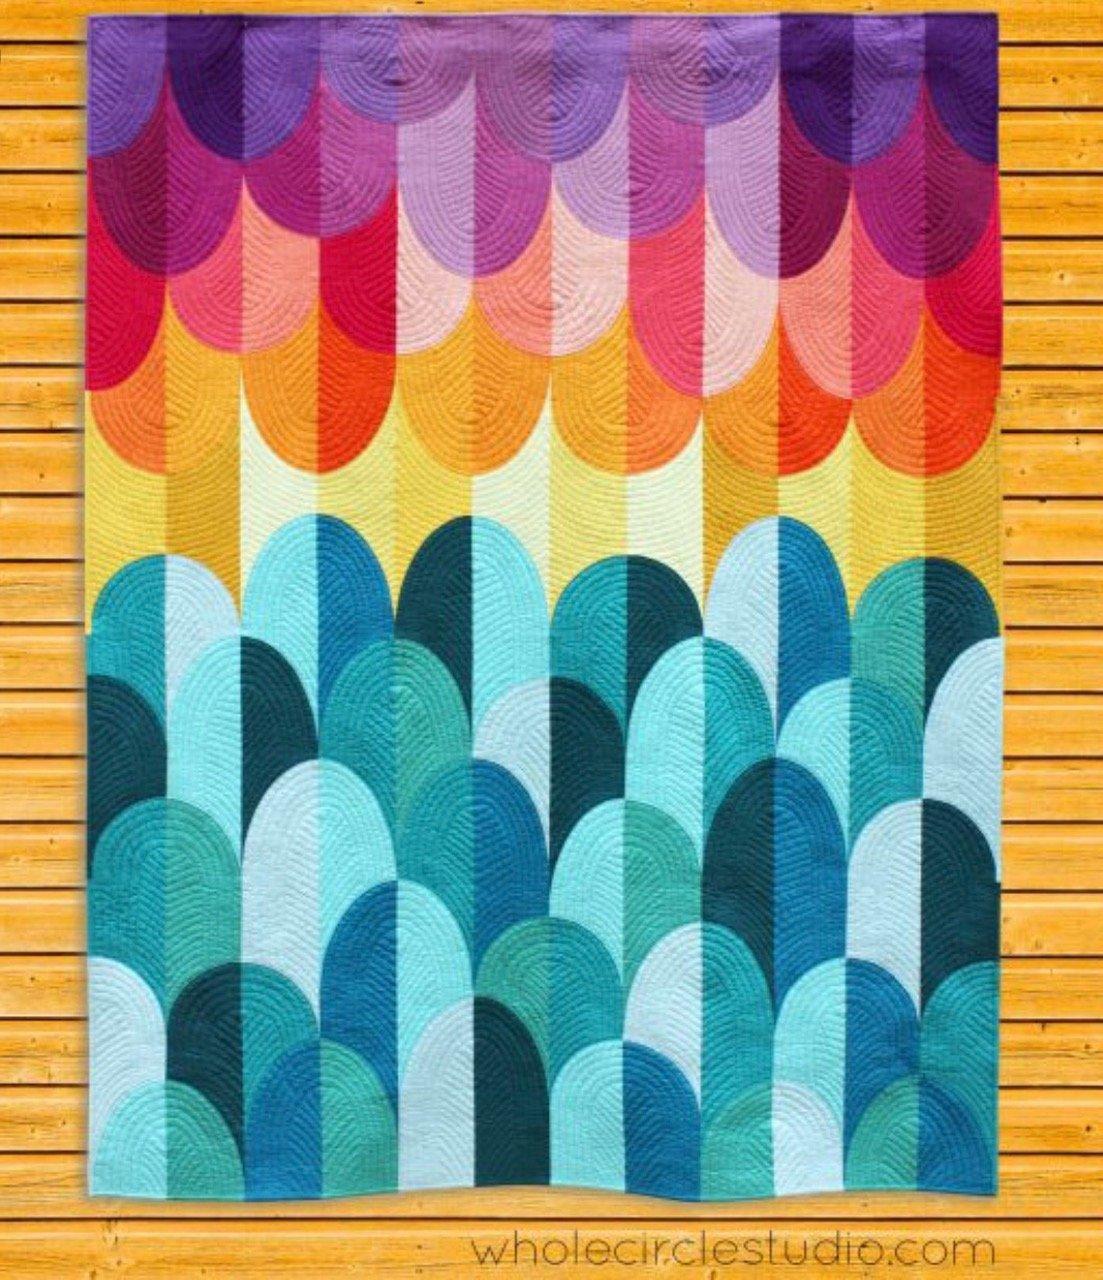 Big Island Sunset Quilt Kit - Pattern by Sheri Cifaldi-Morrill and Fabric by Robert Kaufman Kona Cottons